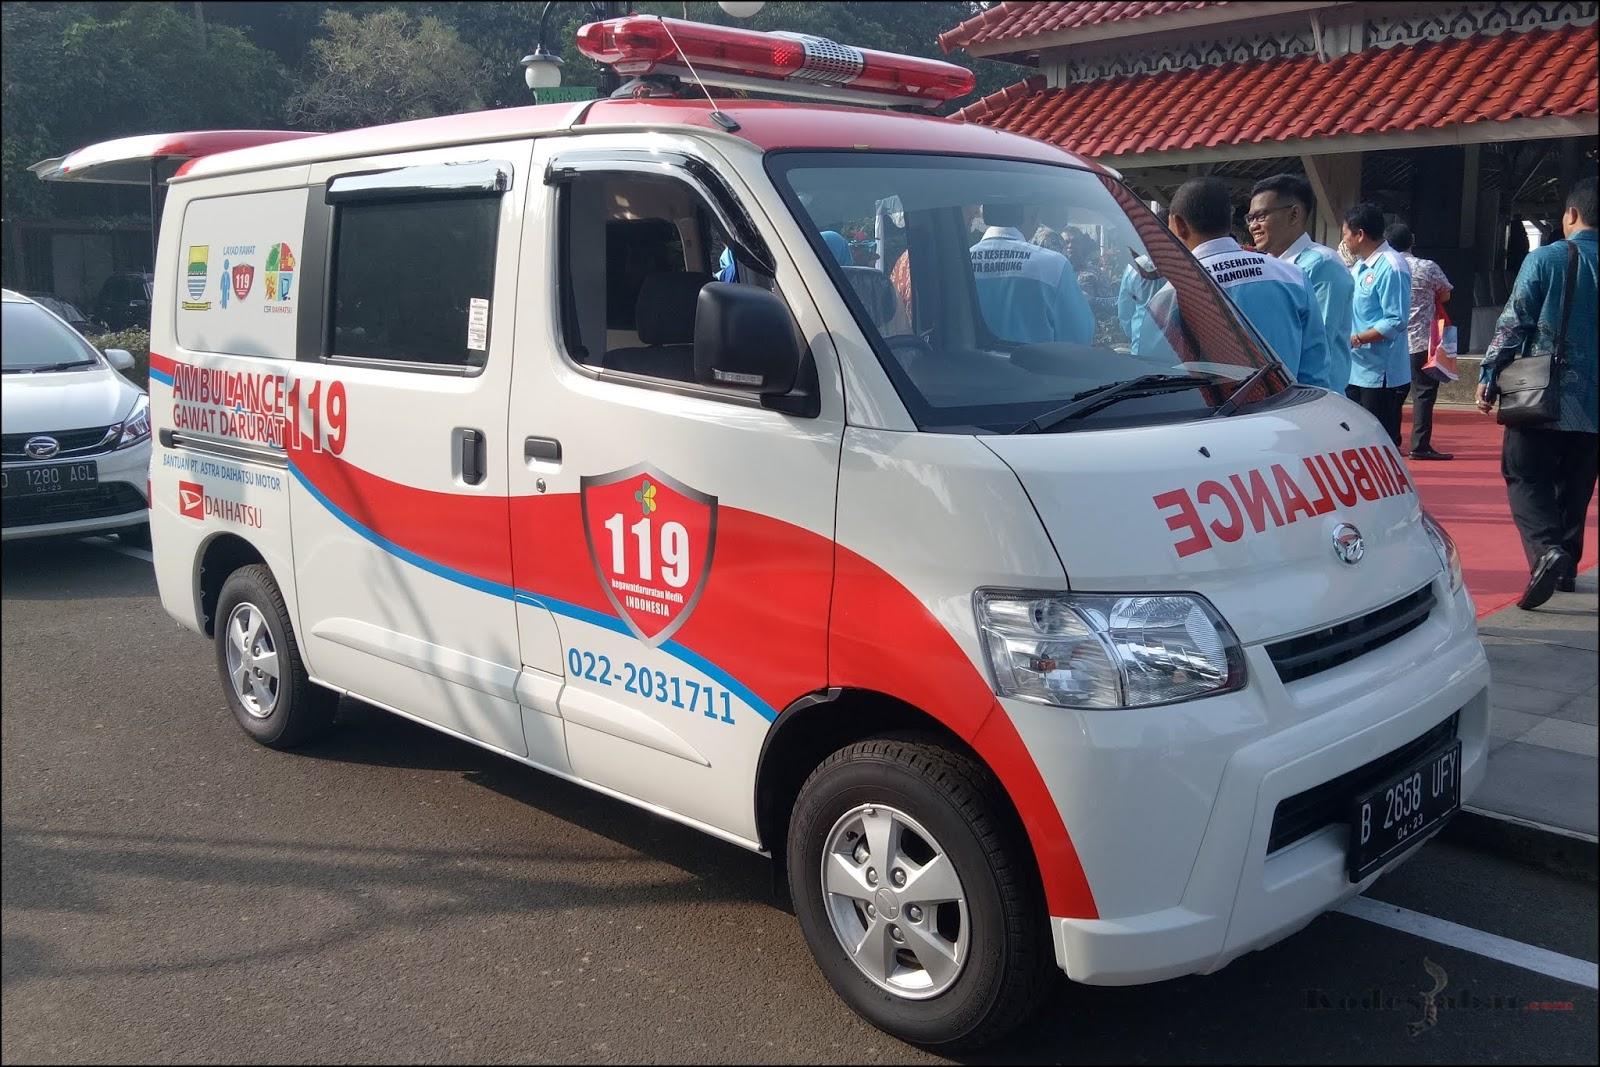 Daihatsu Sumbangkan Ambulans Mini ICU Untuk Dukung Program Layad Rawat Pemkot Bandung